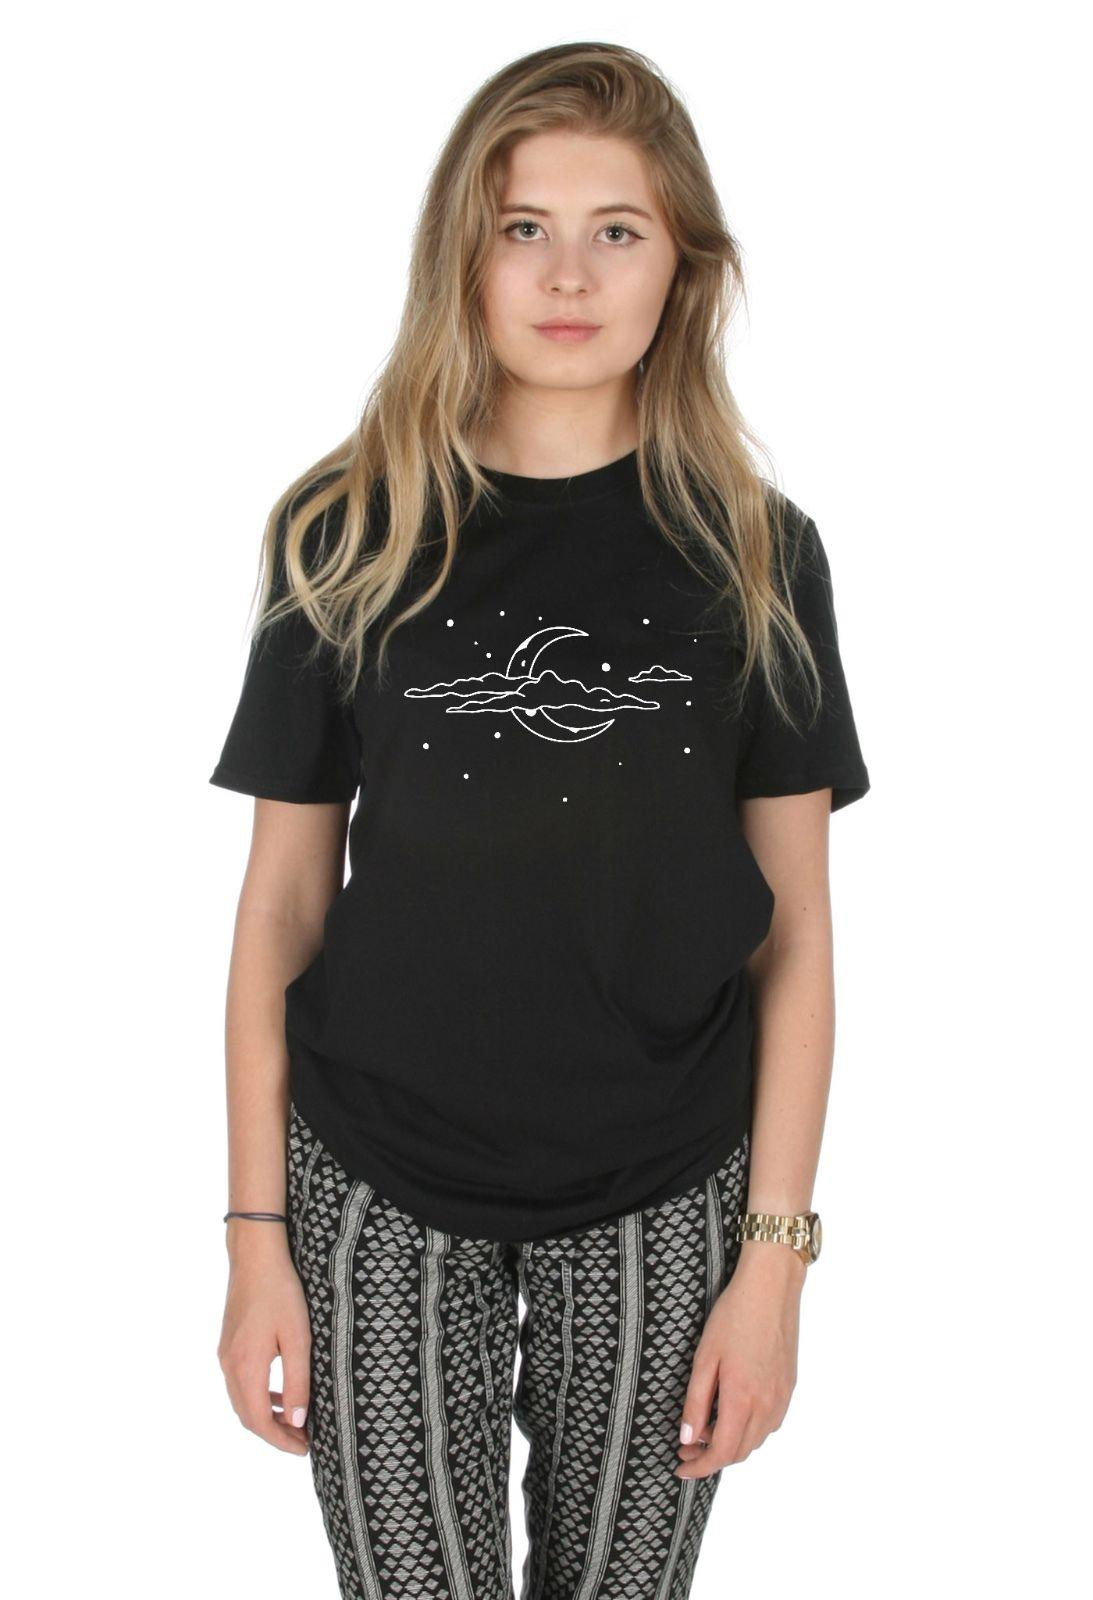 Boho Night Sky T Shirt Top Fashion Tumblr Bohemian Festival Grunge